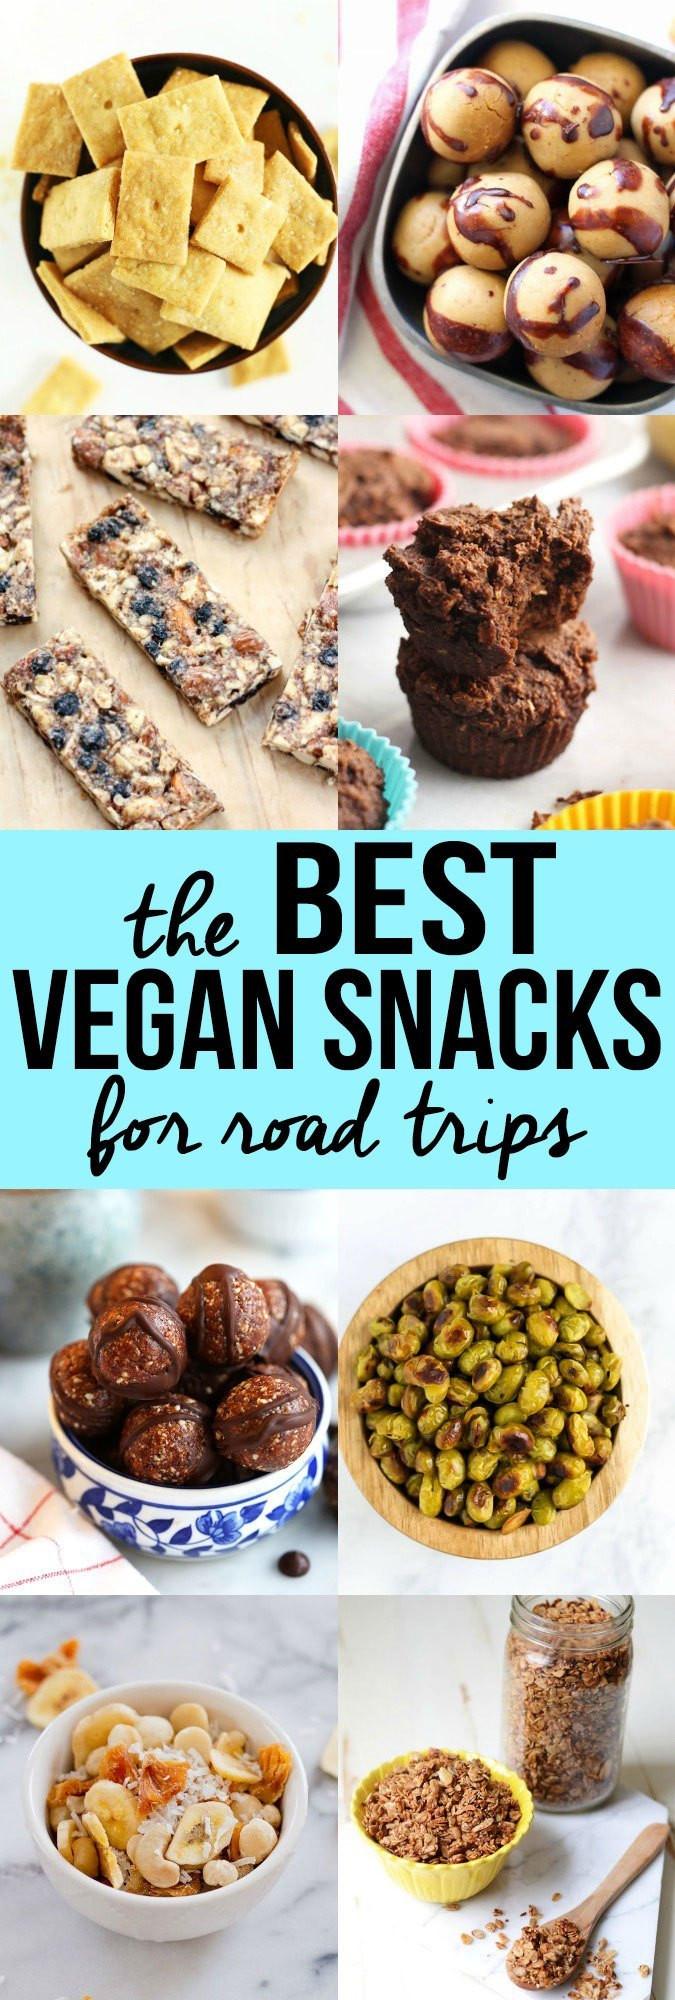 Healthy Store Bought Vegan Snacks  The Best Vegan Snacks for Road Trips